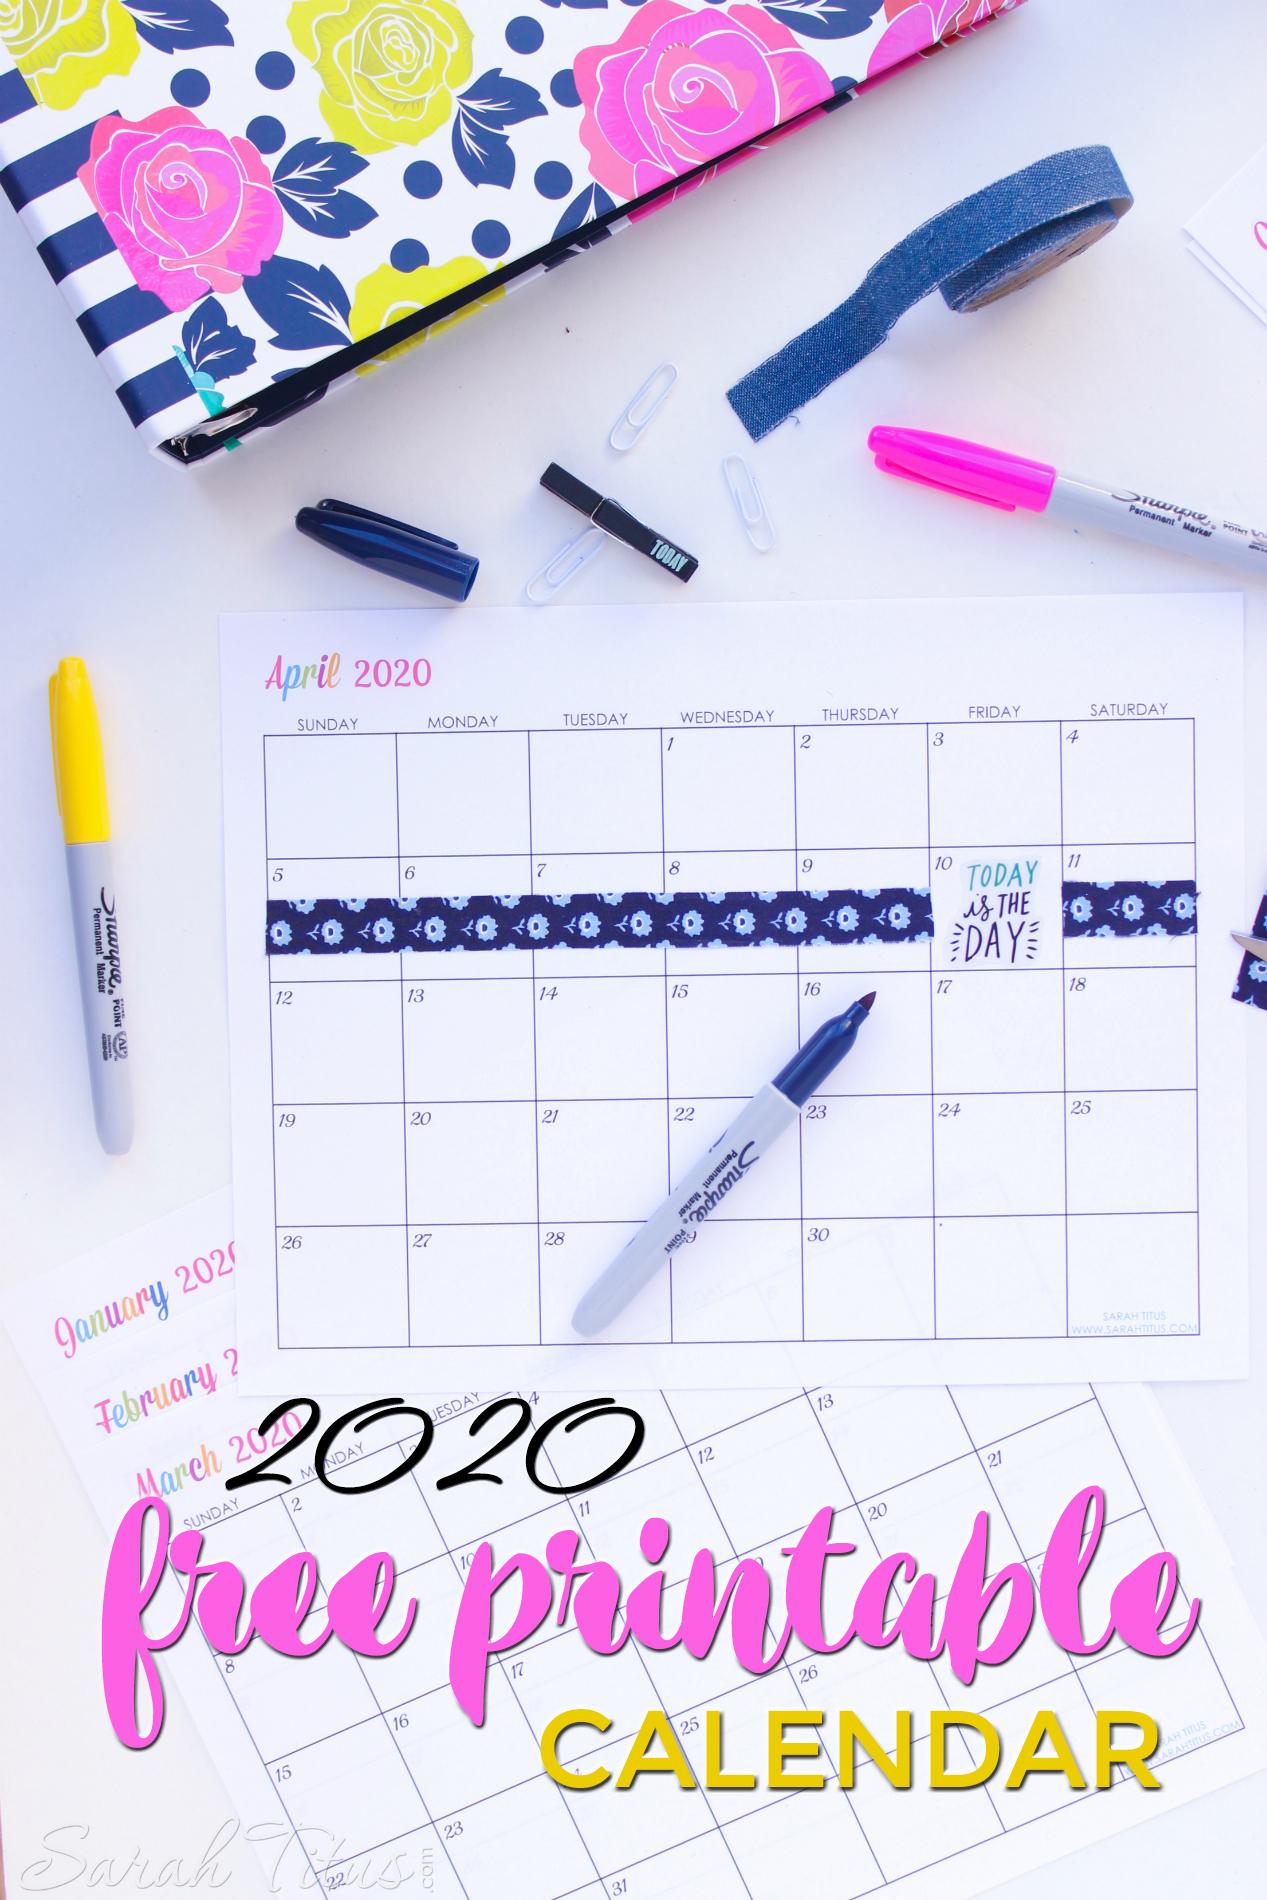 Custom Editable 2020 Free Printable Calendars - Sarah Titus in Free Printable 2020 Calendar To I Can Edit